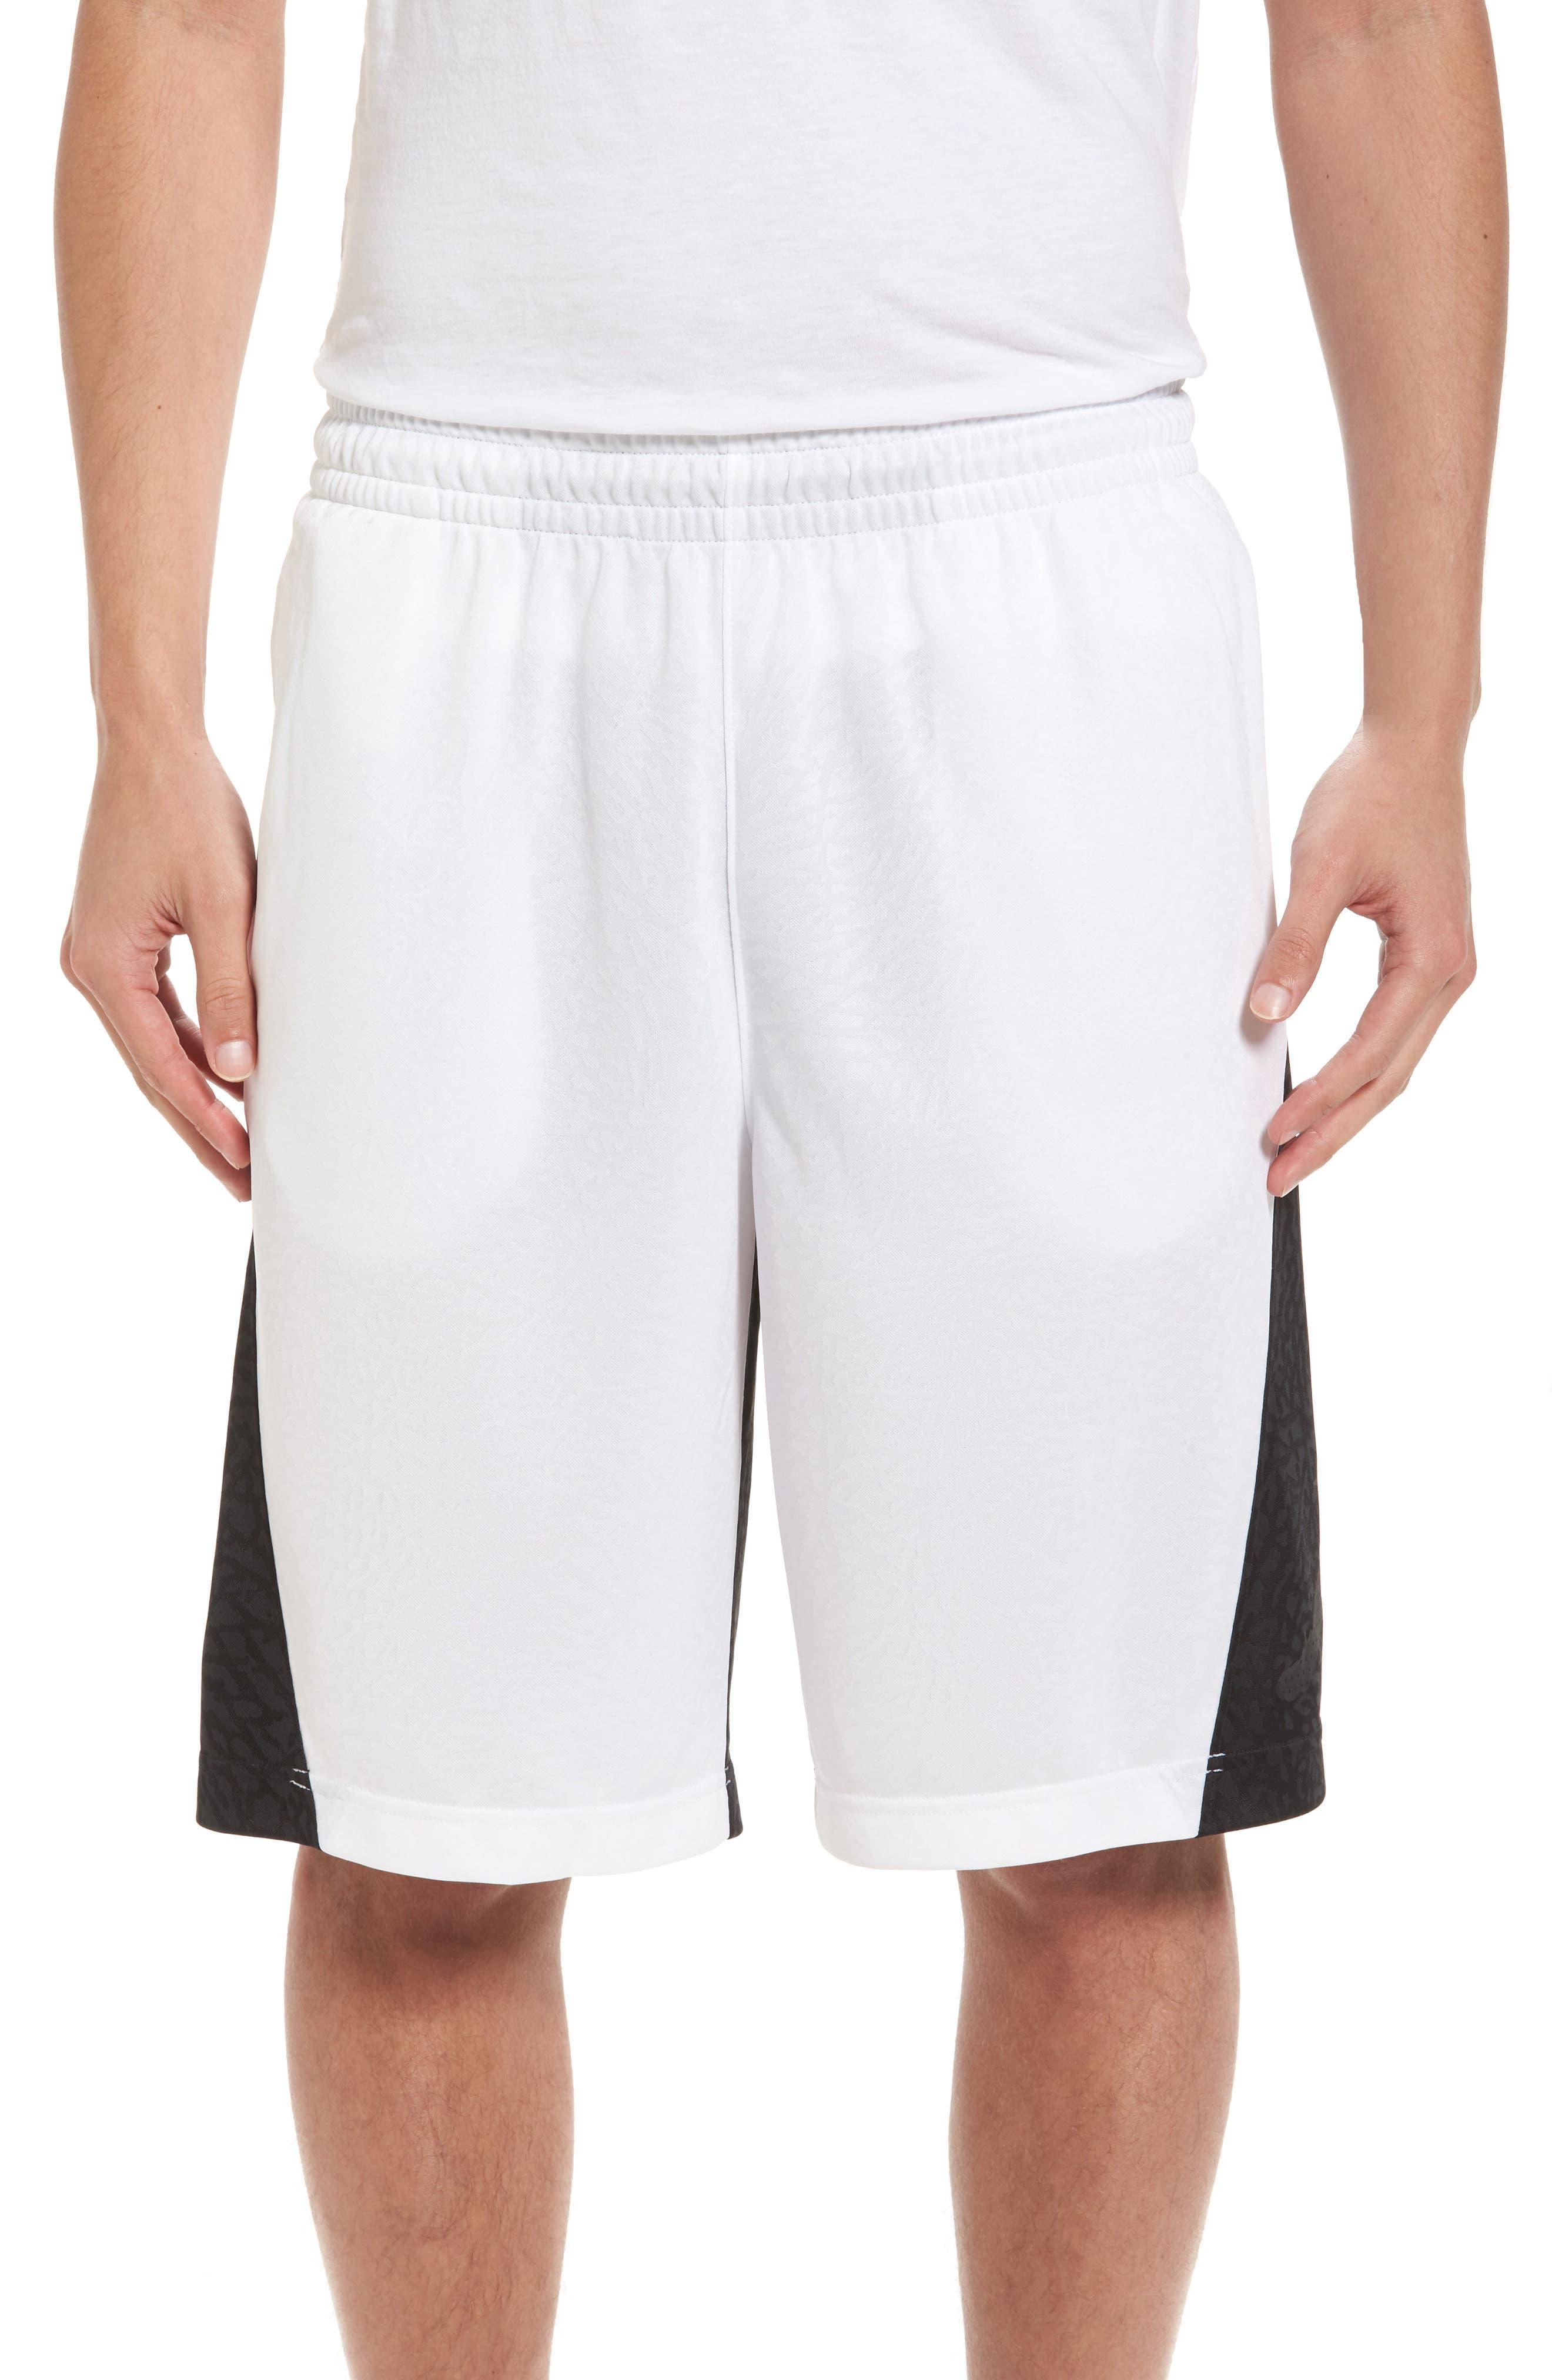 Alternate Image 1 Selected - Nike Jordan Rise Vertical Basketball Shorts